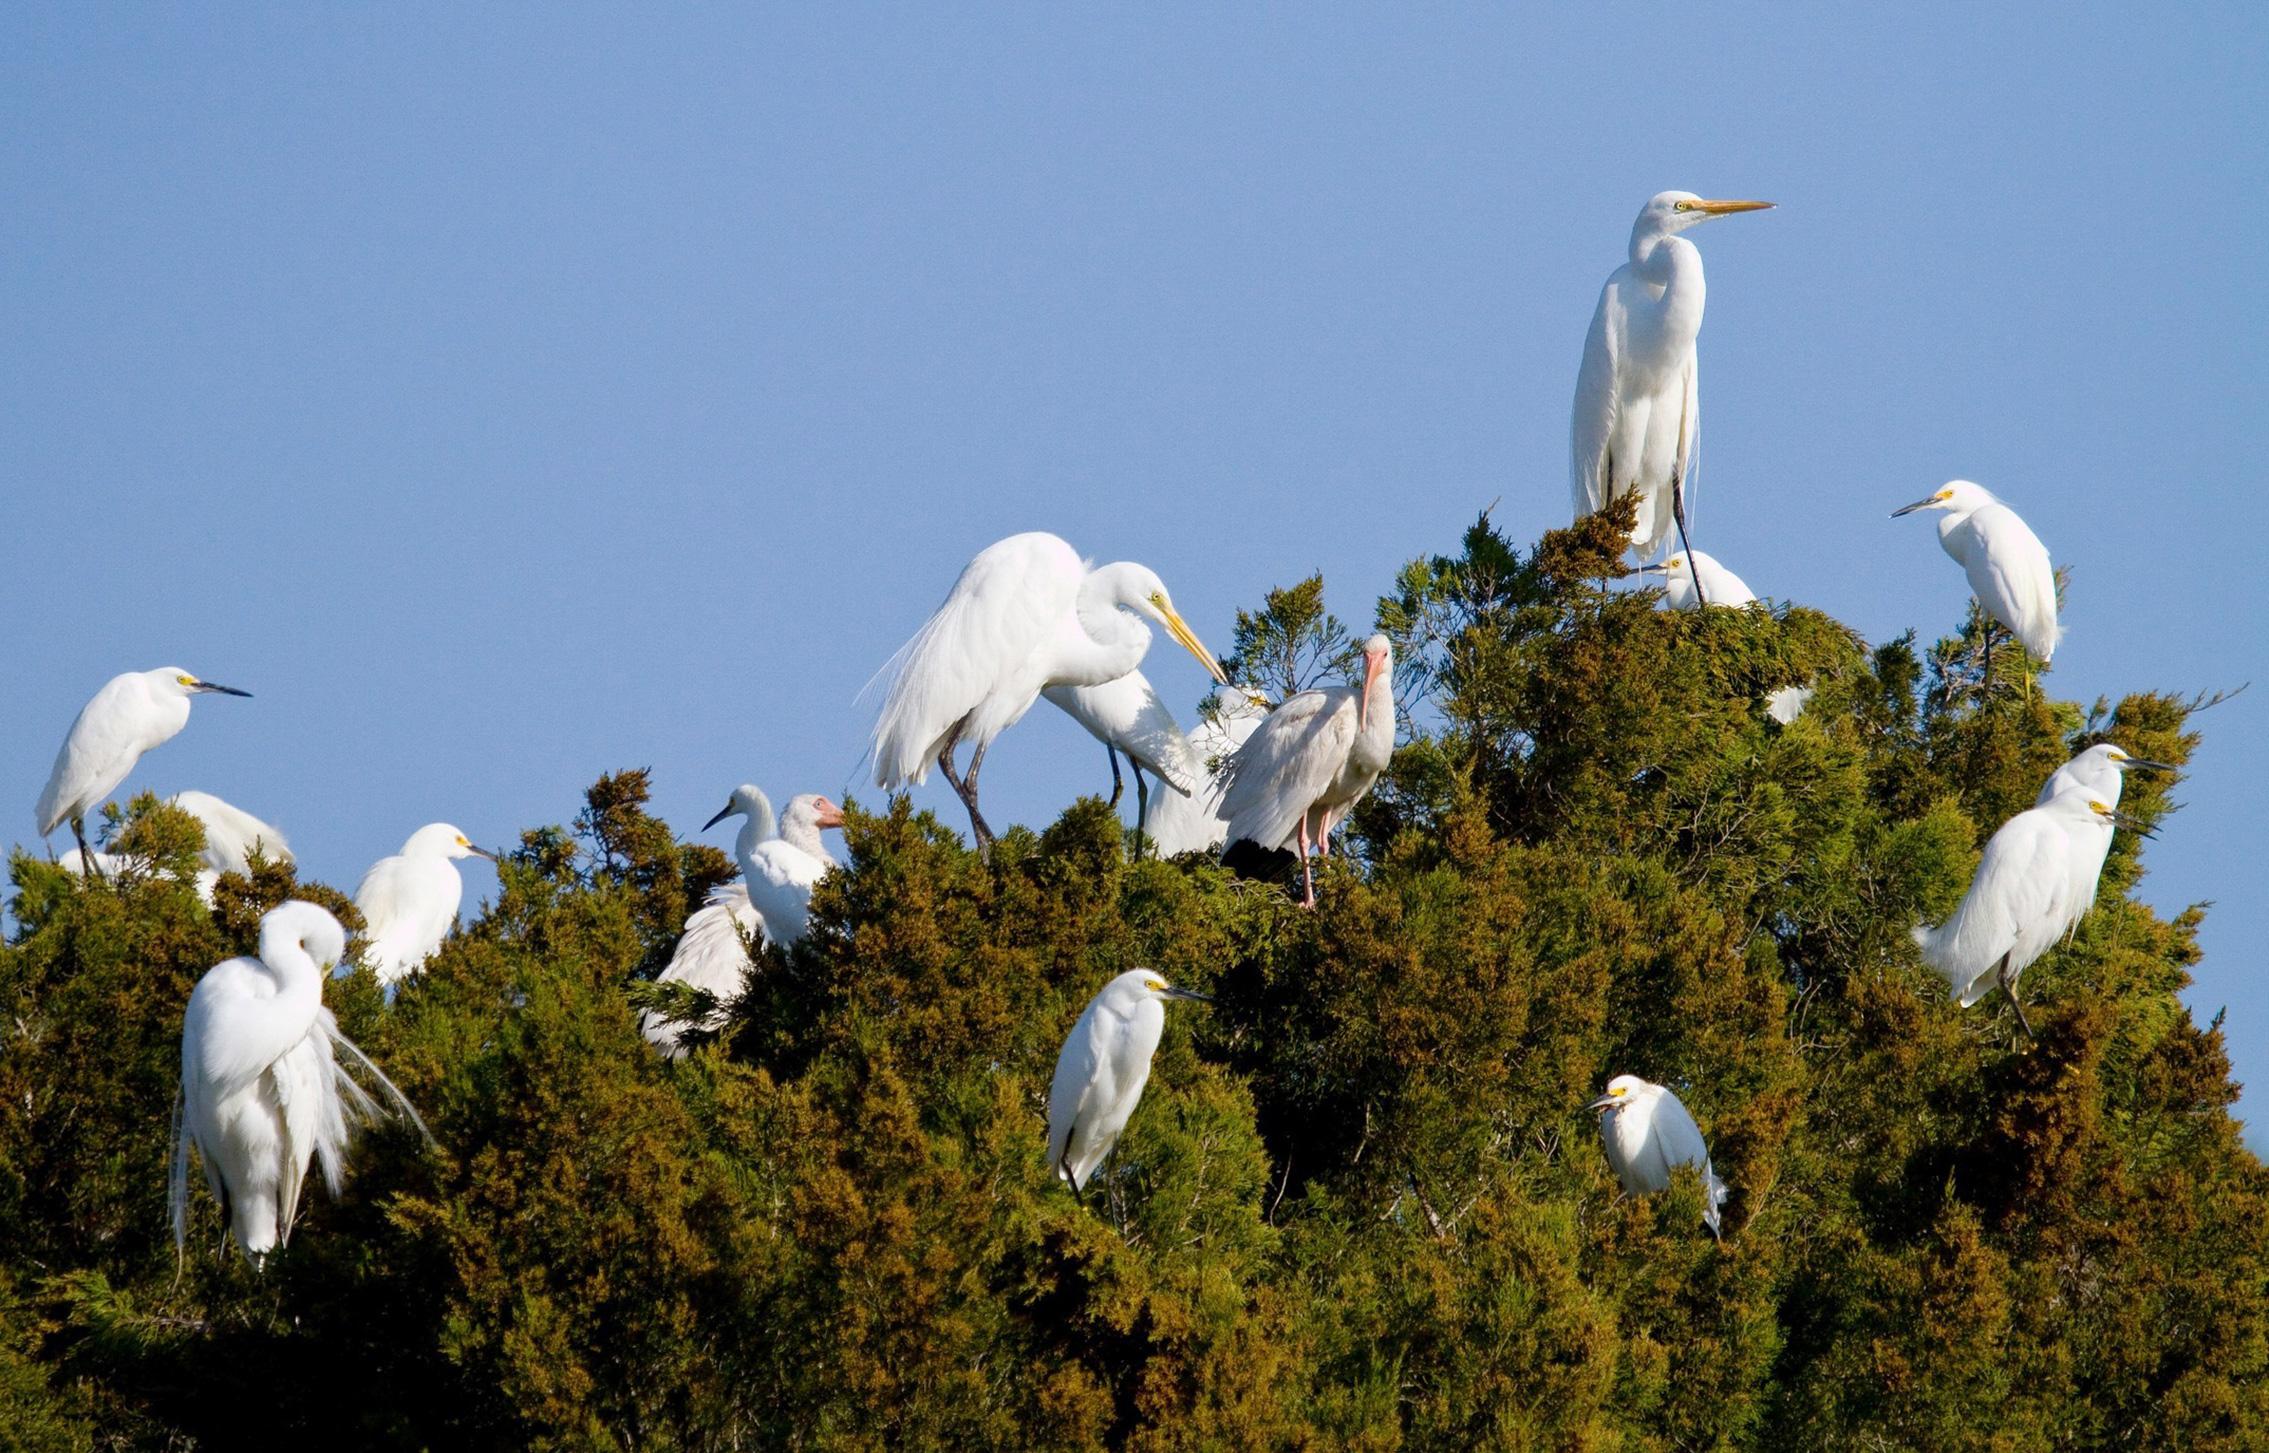 Great Egrets, Snowy Egrets, and White Ibises. Mark Eden/Audubon Photography Awards